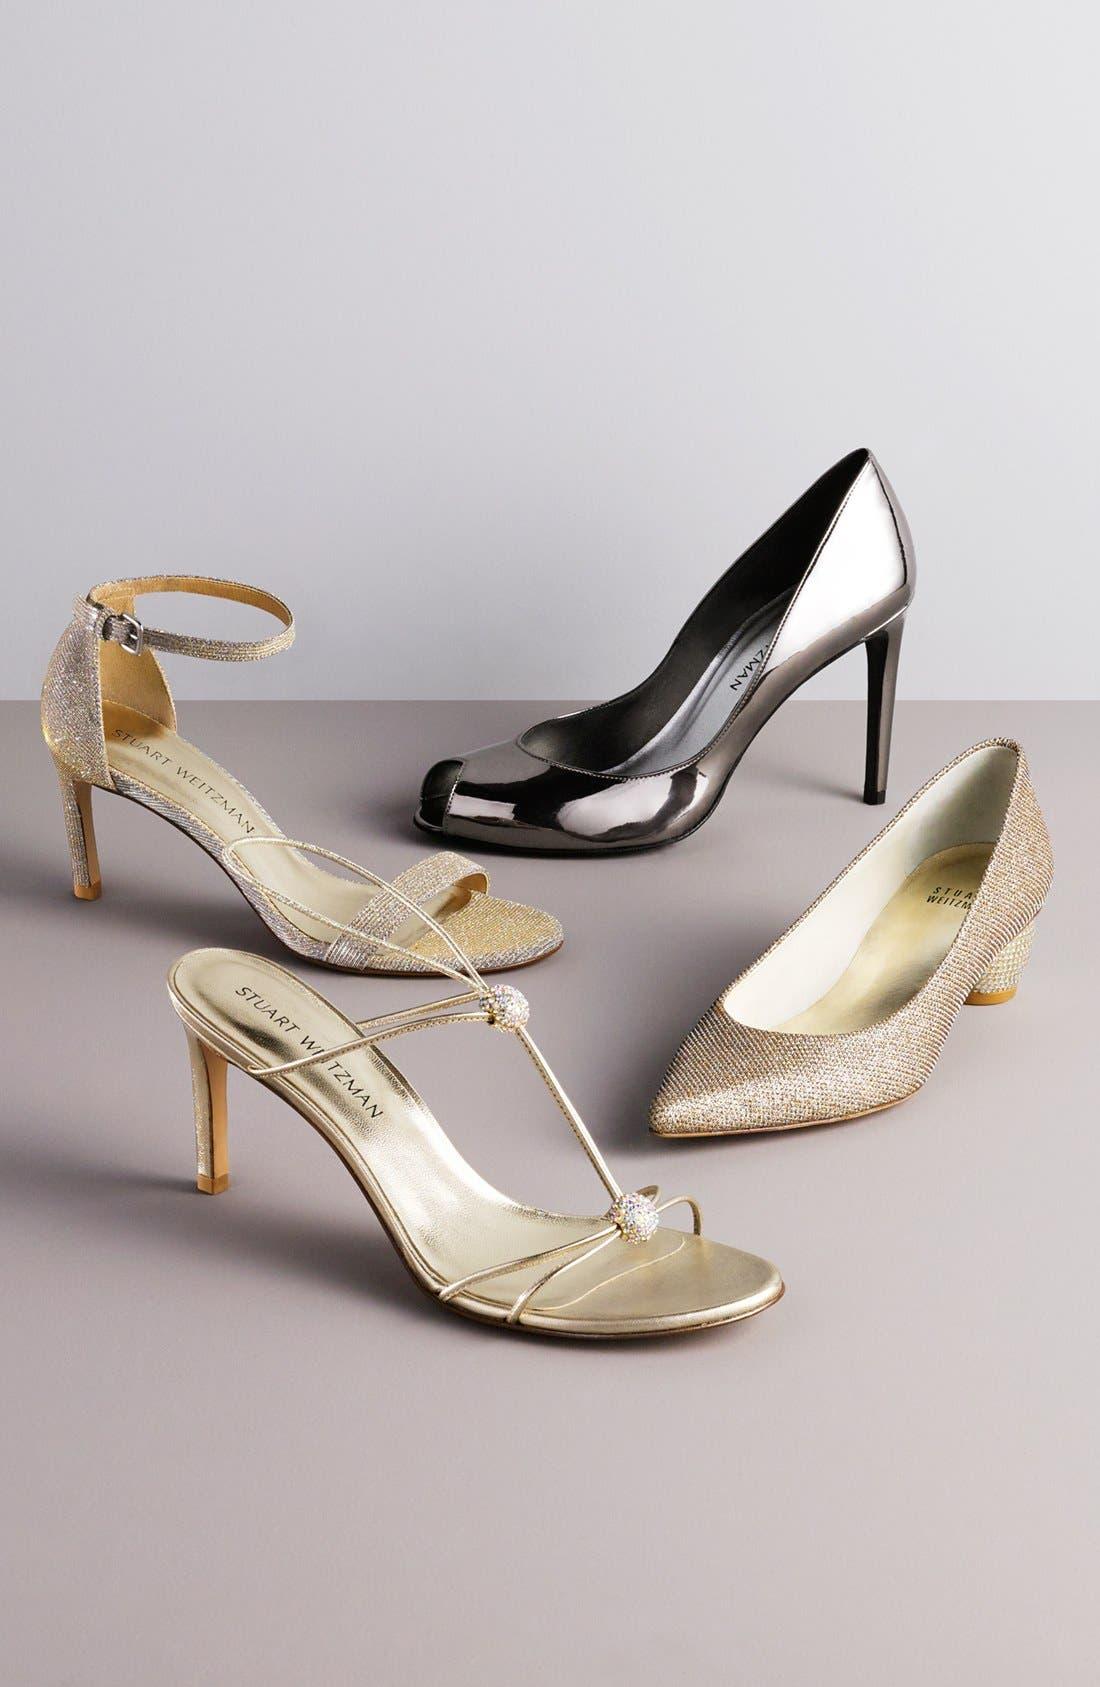 STUART WEITZMAN, 'Nunaked' Leather Ankle Strap Sandal, Main thumbnail 1, color, 001